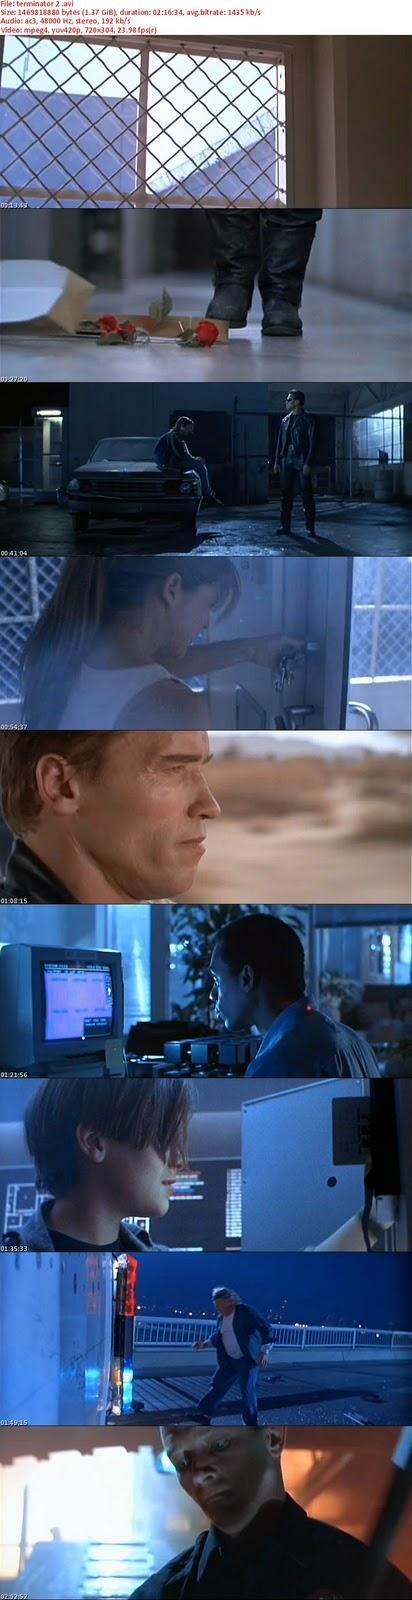 Terminator 2 descargar gratis avi